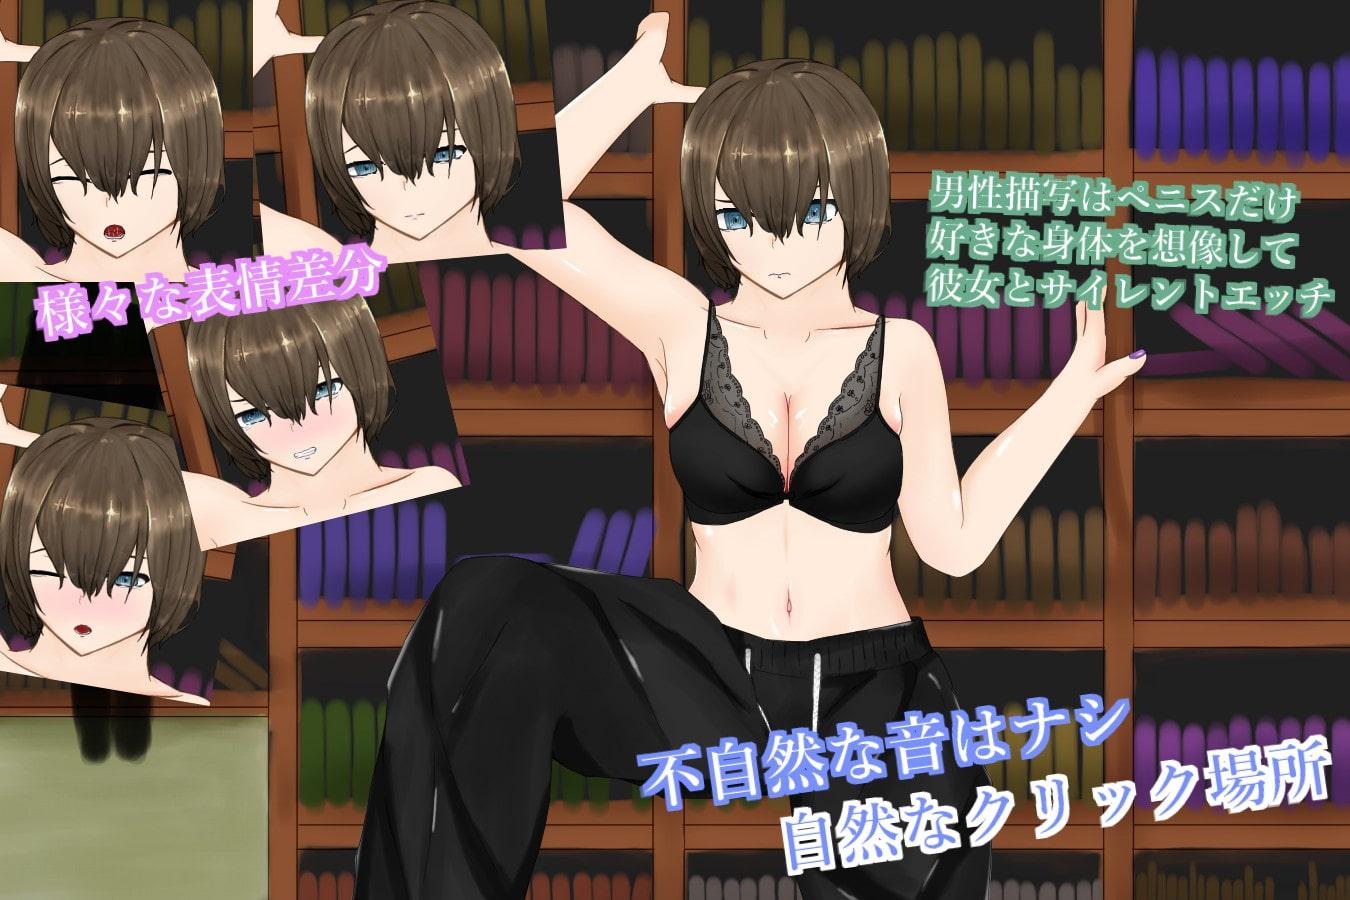 SilentTimeDarkGirl~ストレートダウナー系クール彼女と声を出せない図書館エッチ~